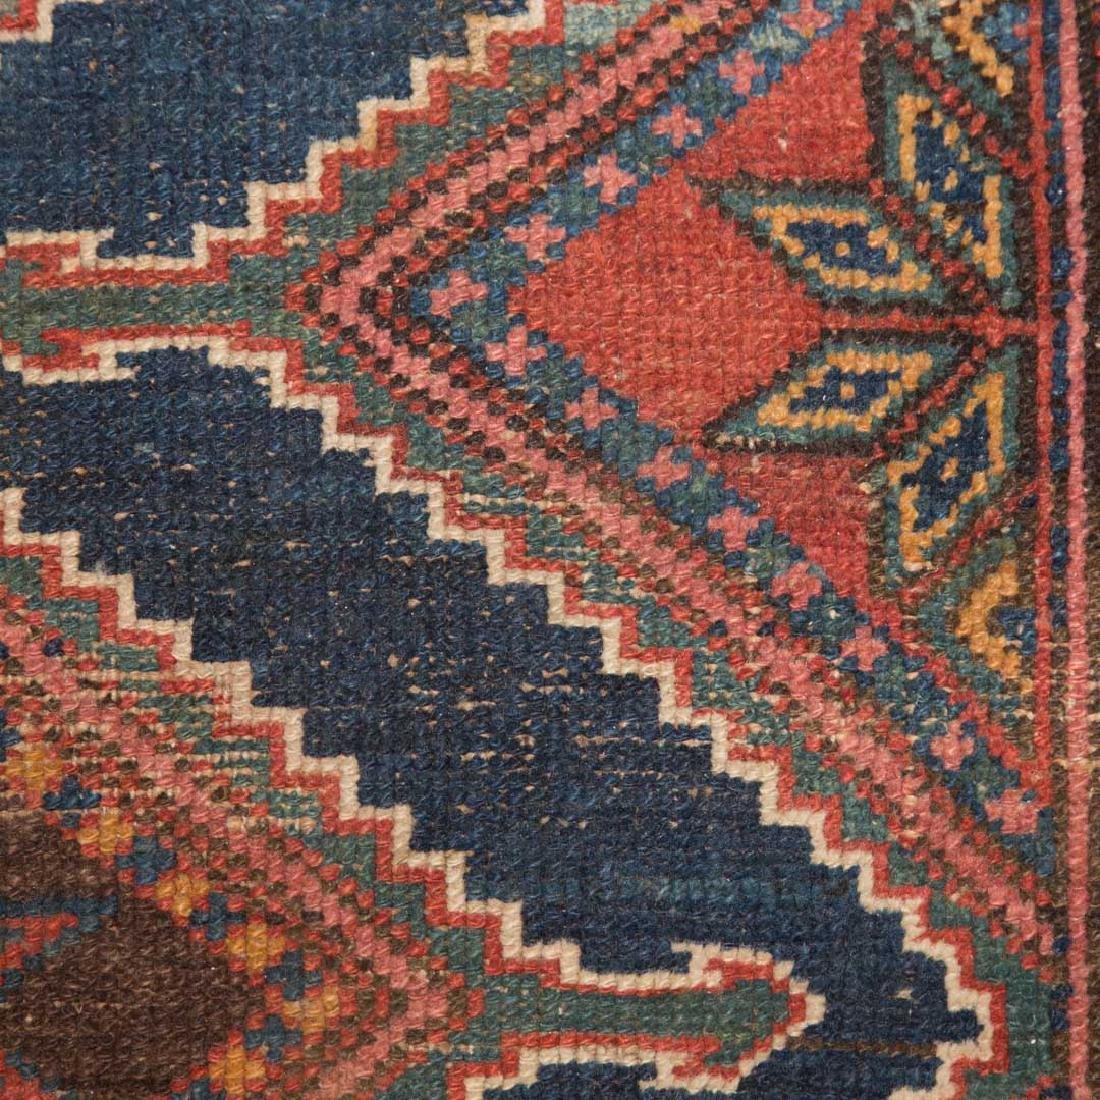 Antique Hamadan rug, approx. 3.10 x 6 - 4